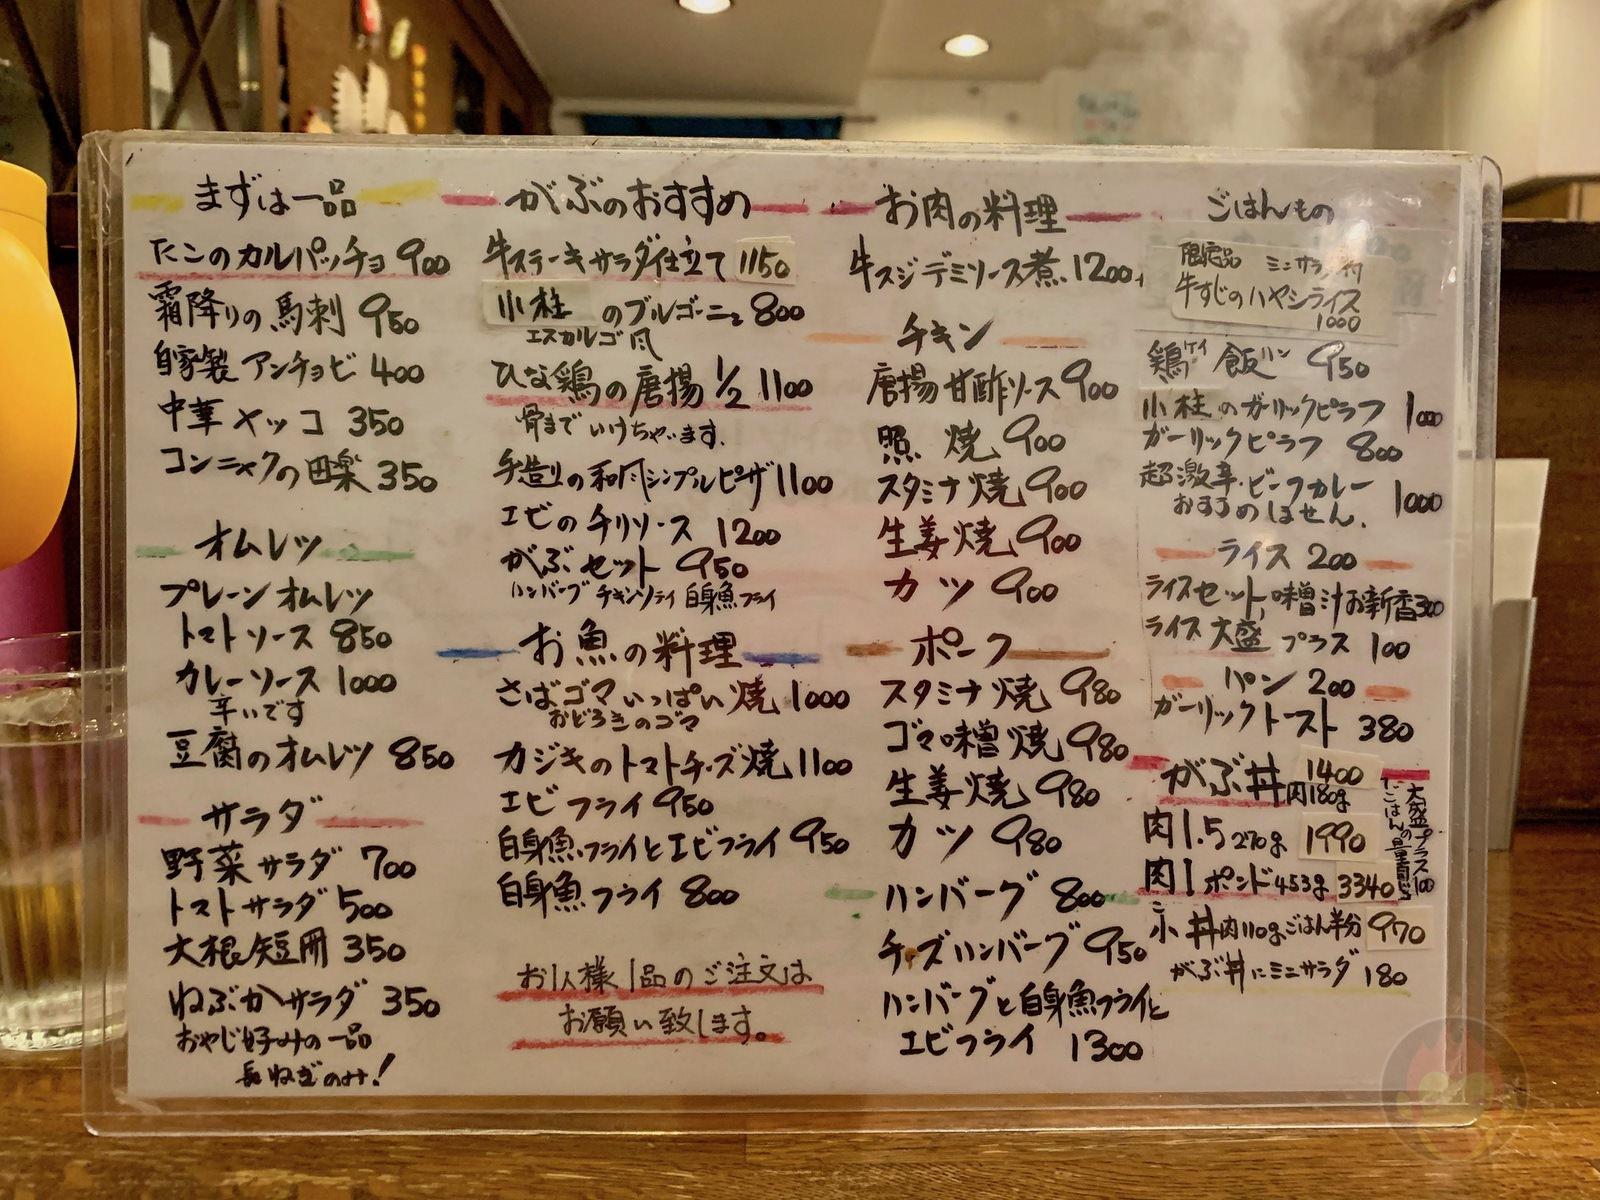 Kuisinbo Gabu Musasi koyama 03